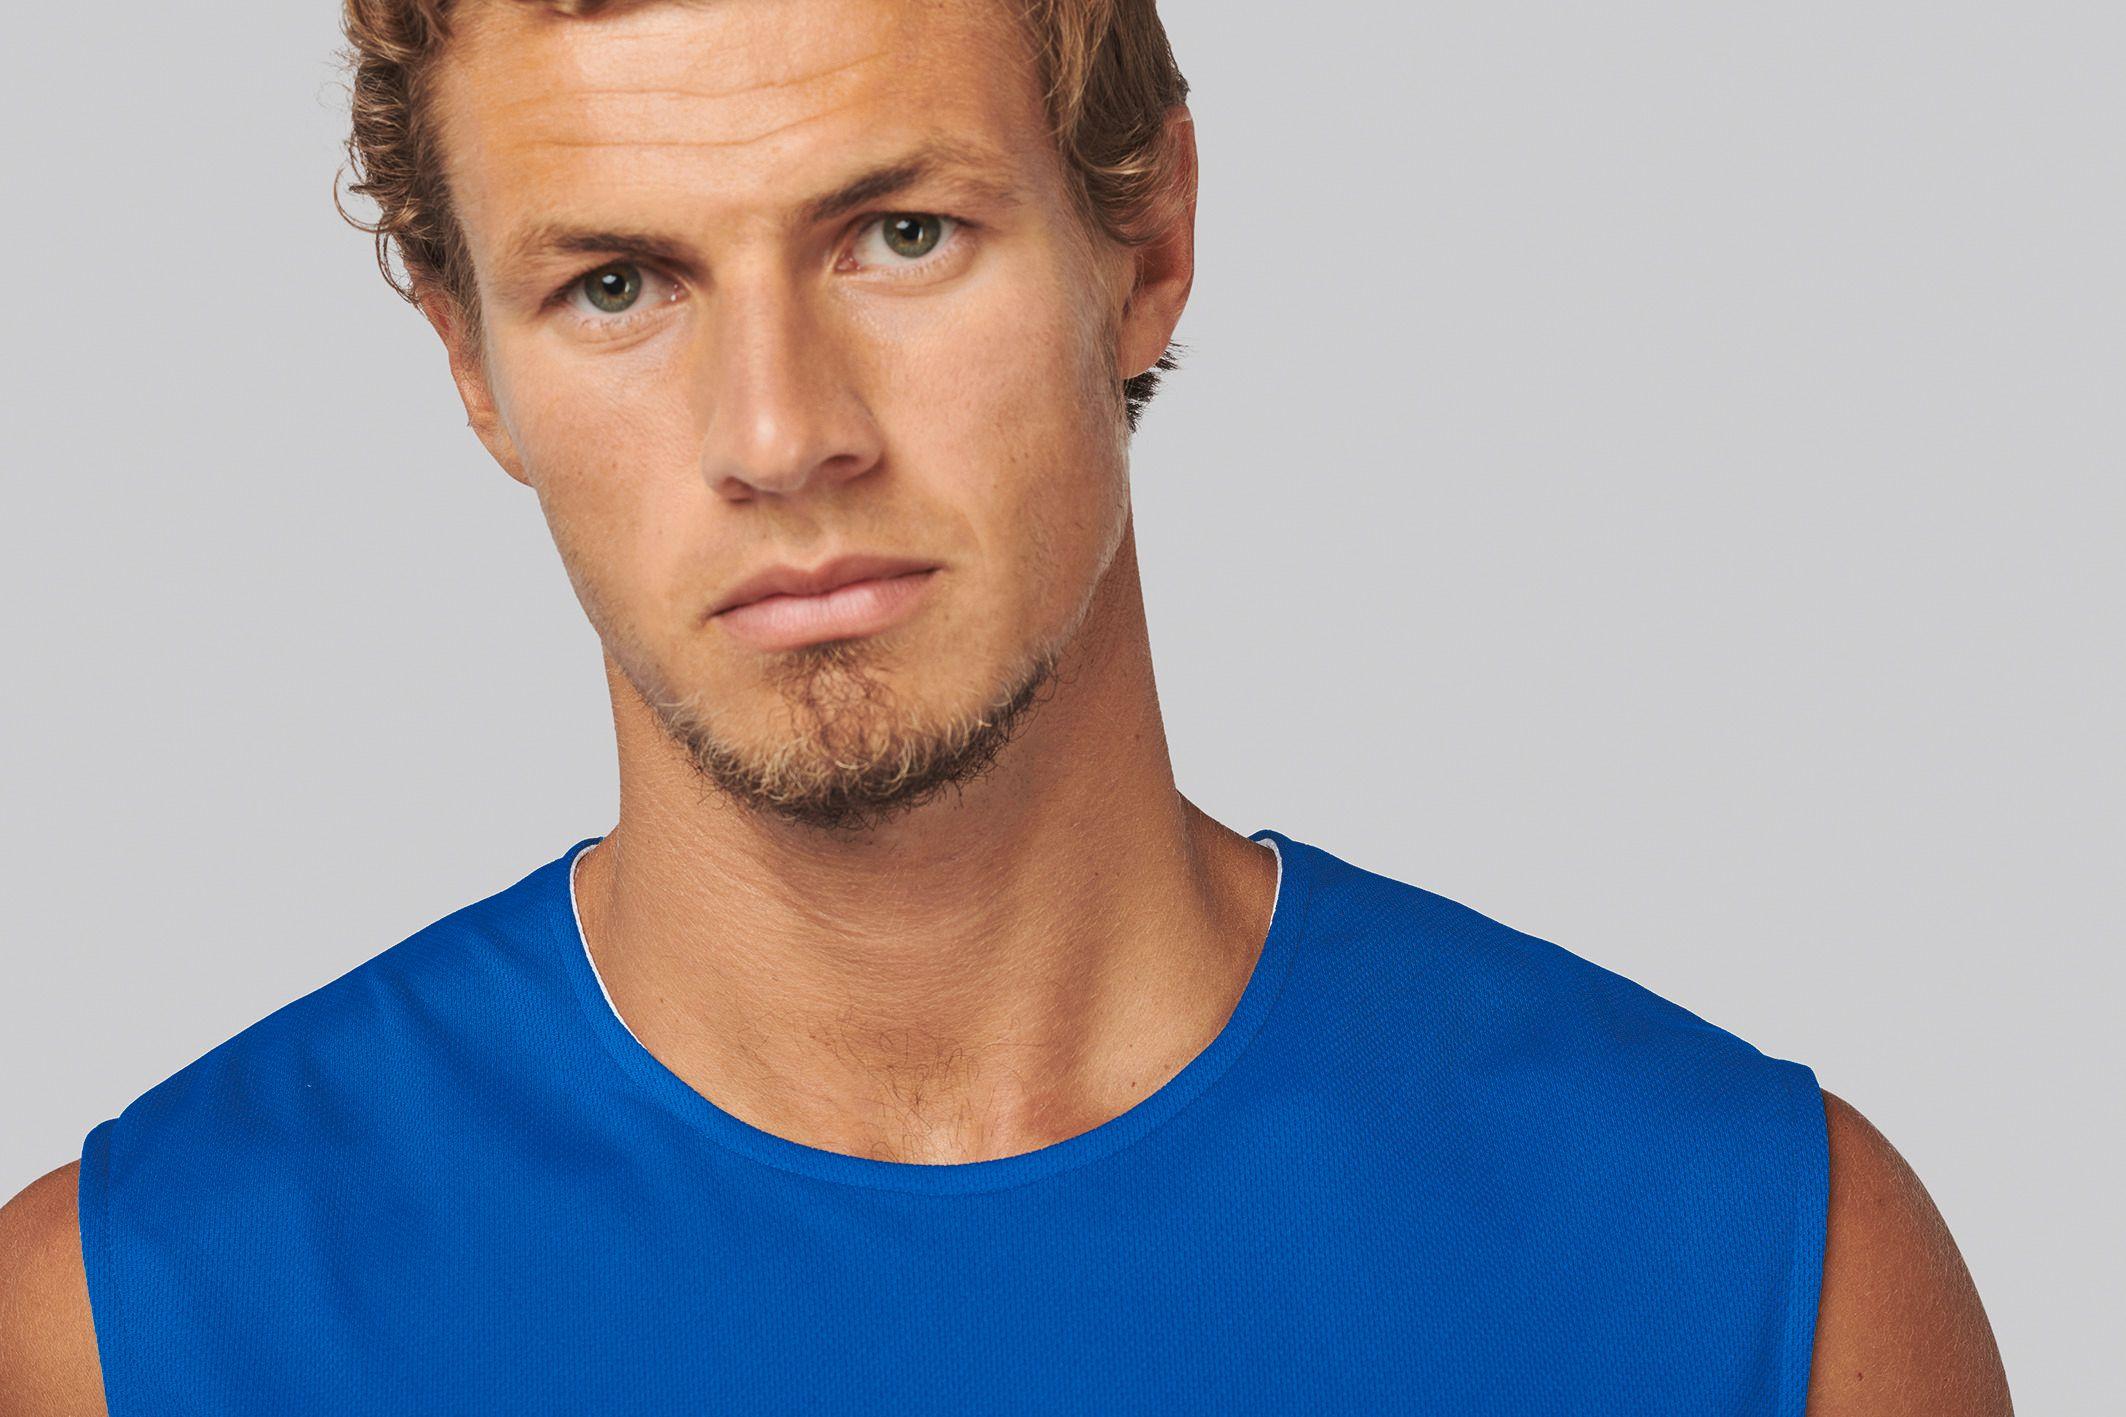 Sportovní dres - oboustranné trièko bez rukávù